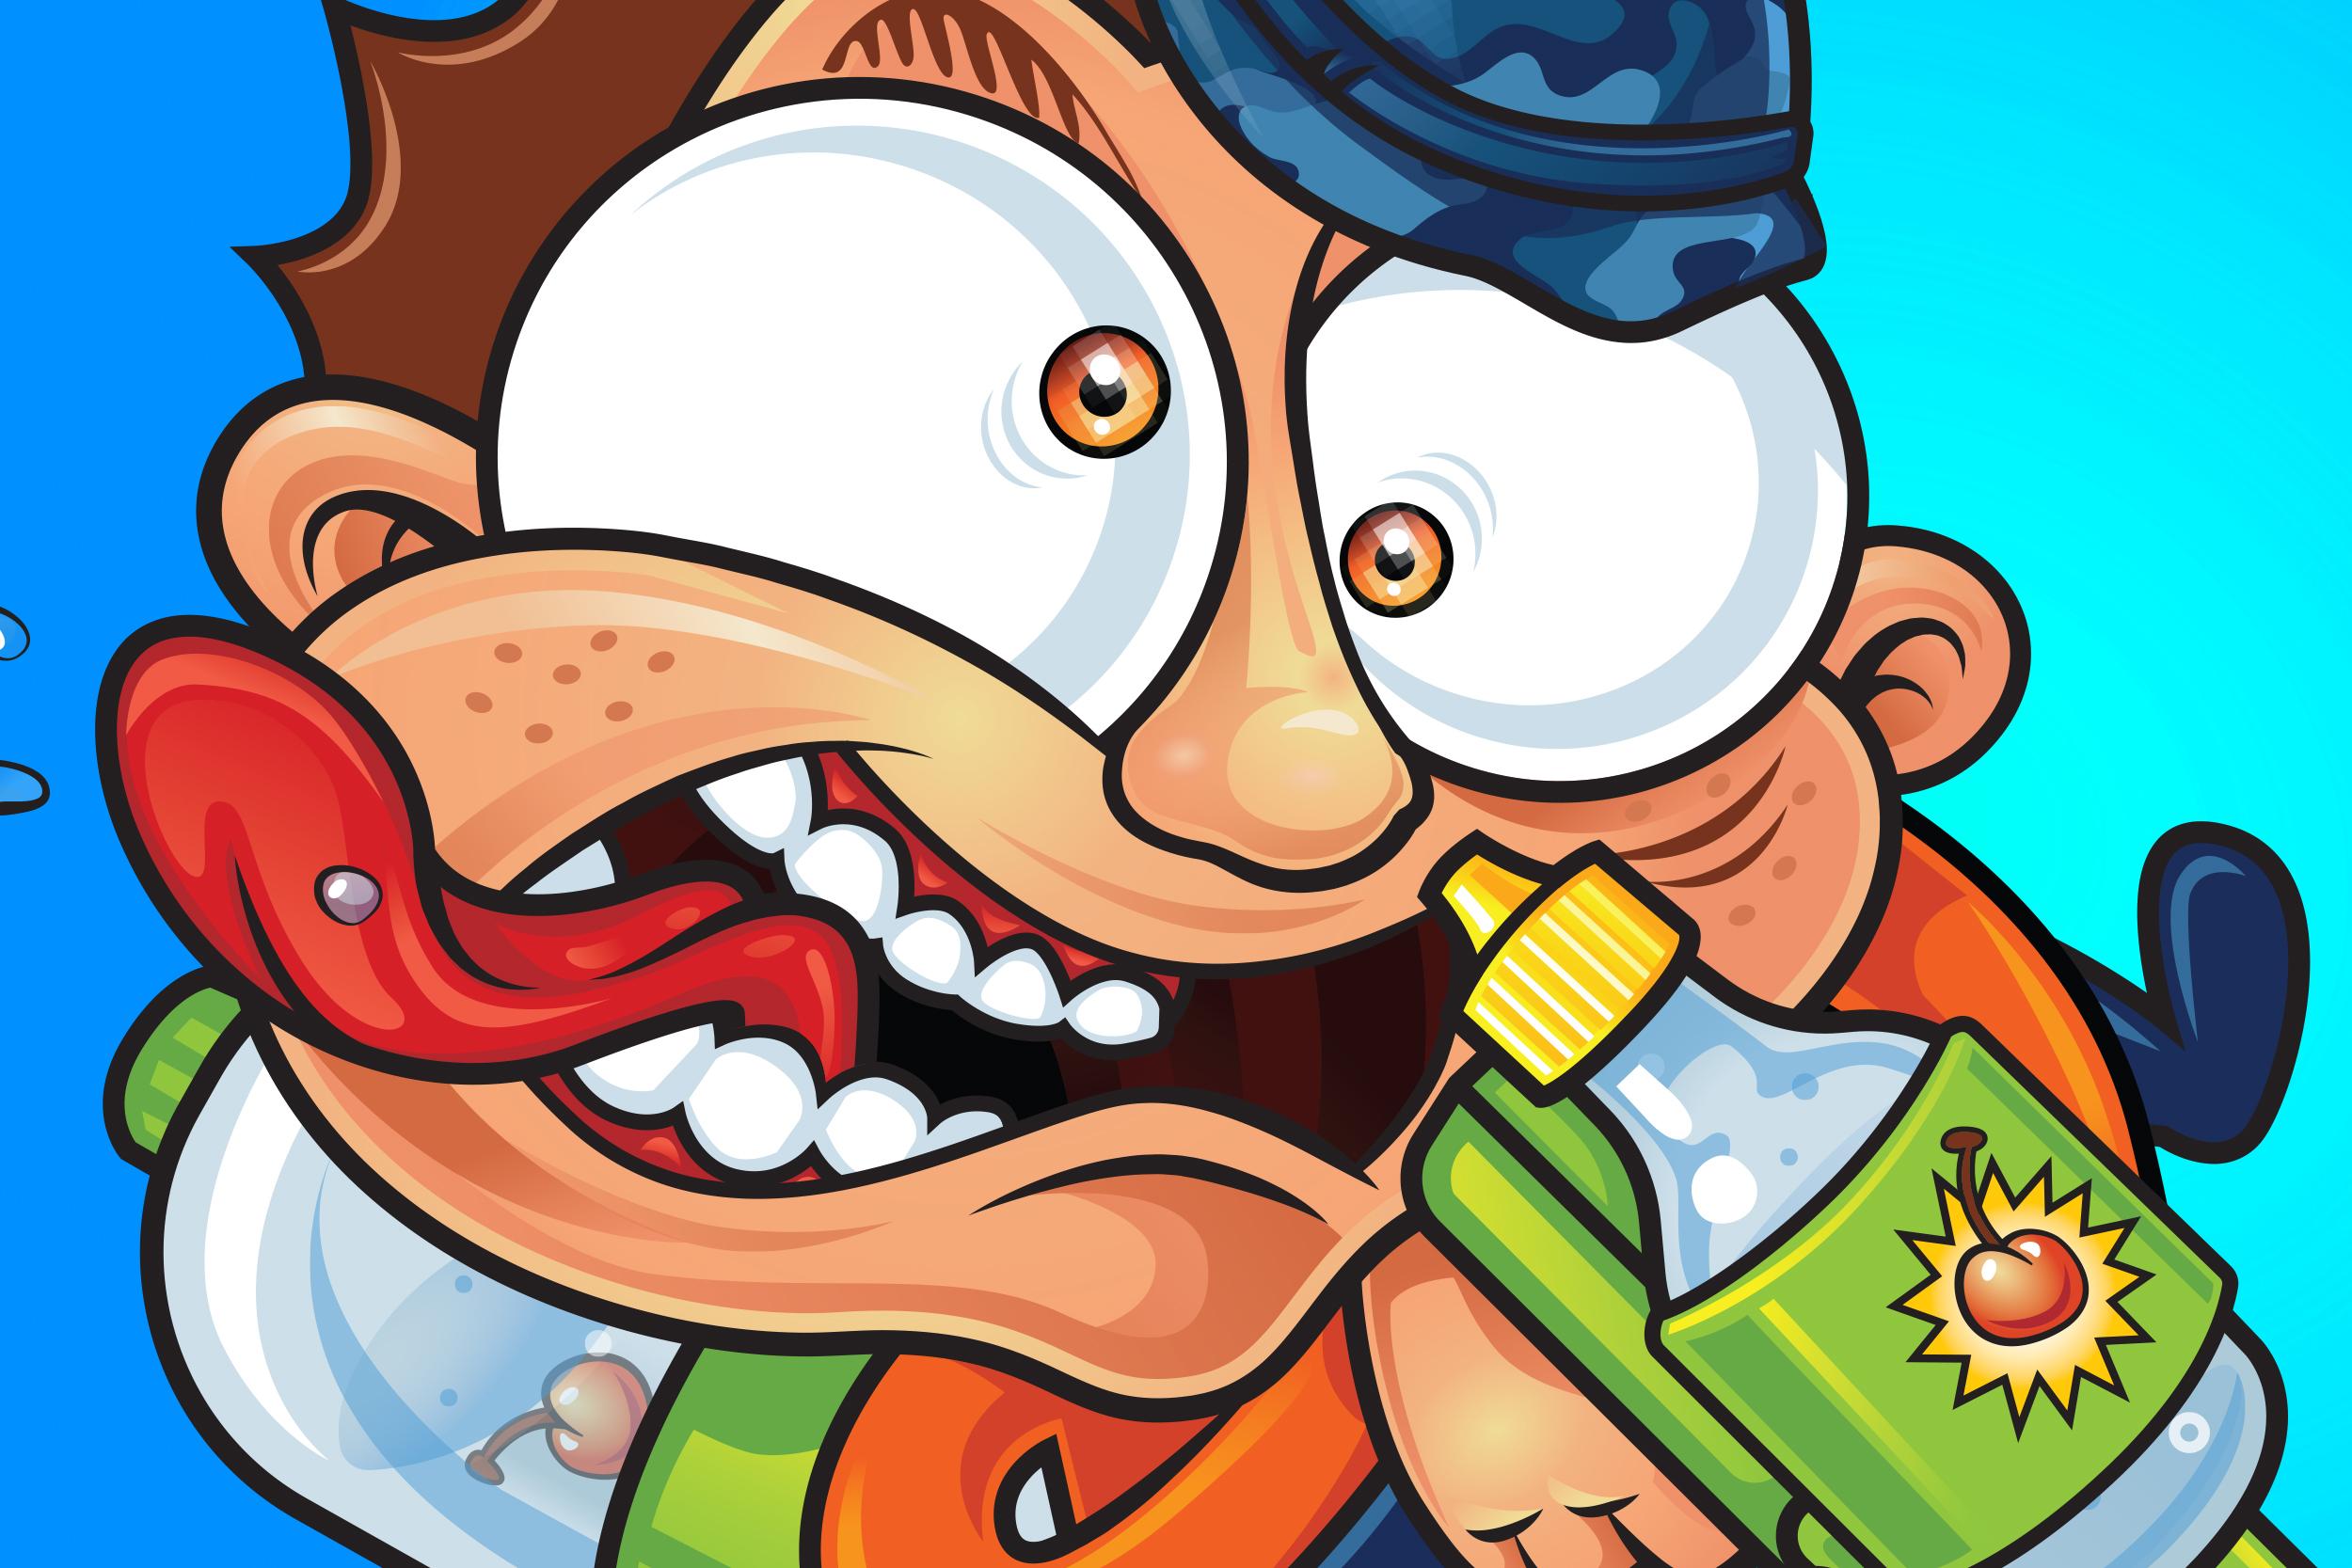 quikTrip Wally Juice - C-store Packaging for Kids